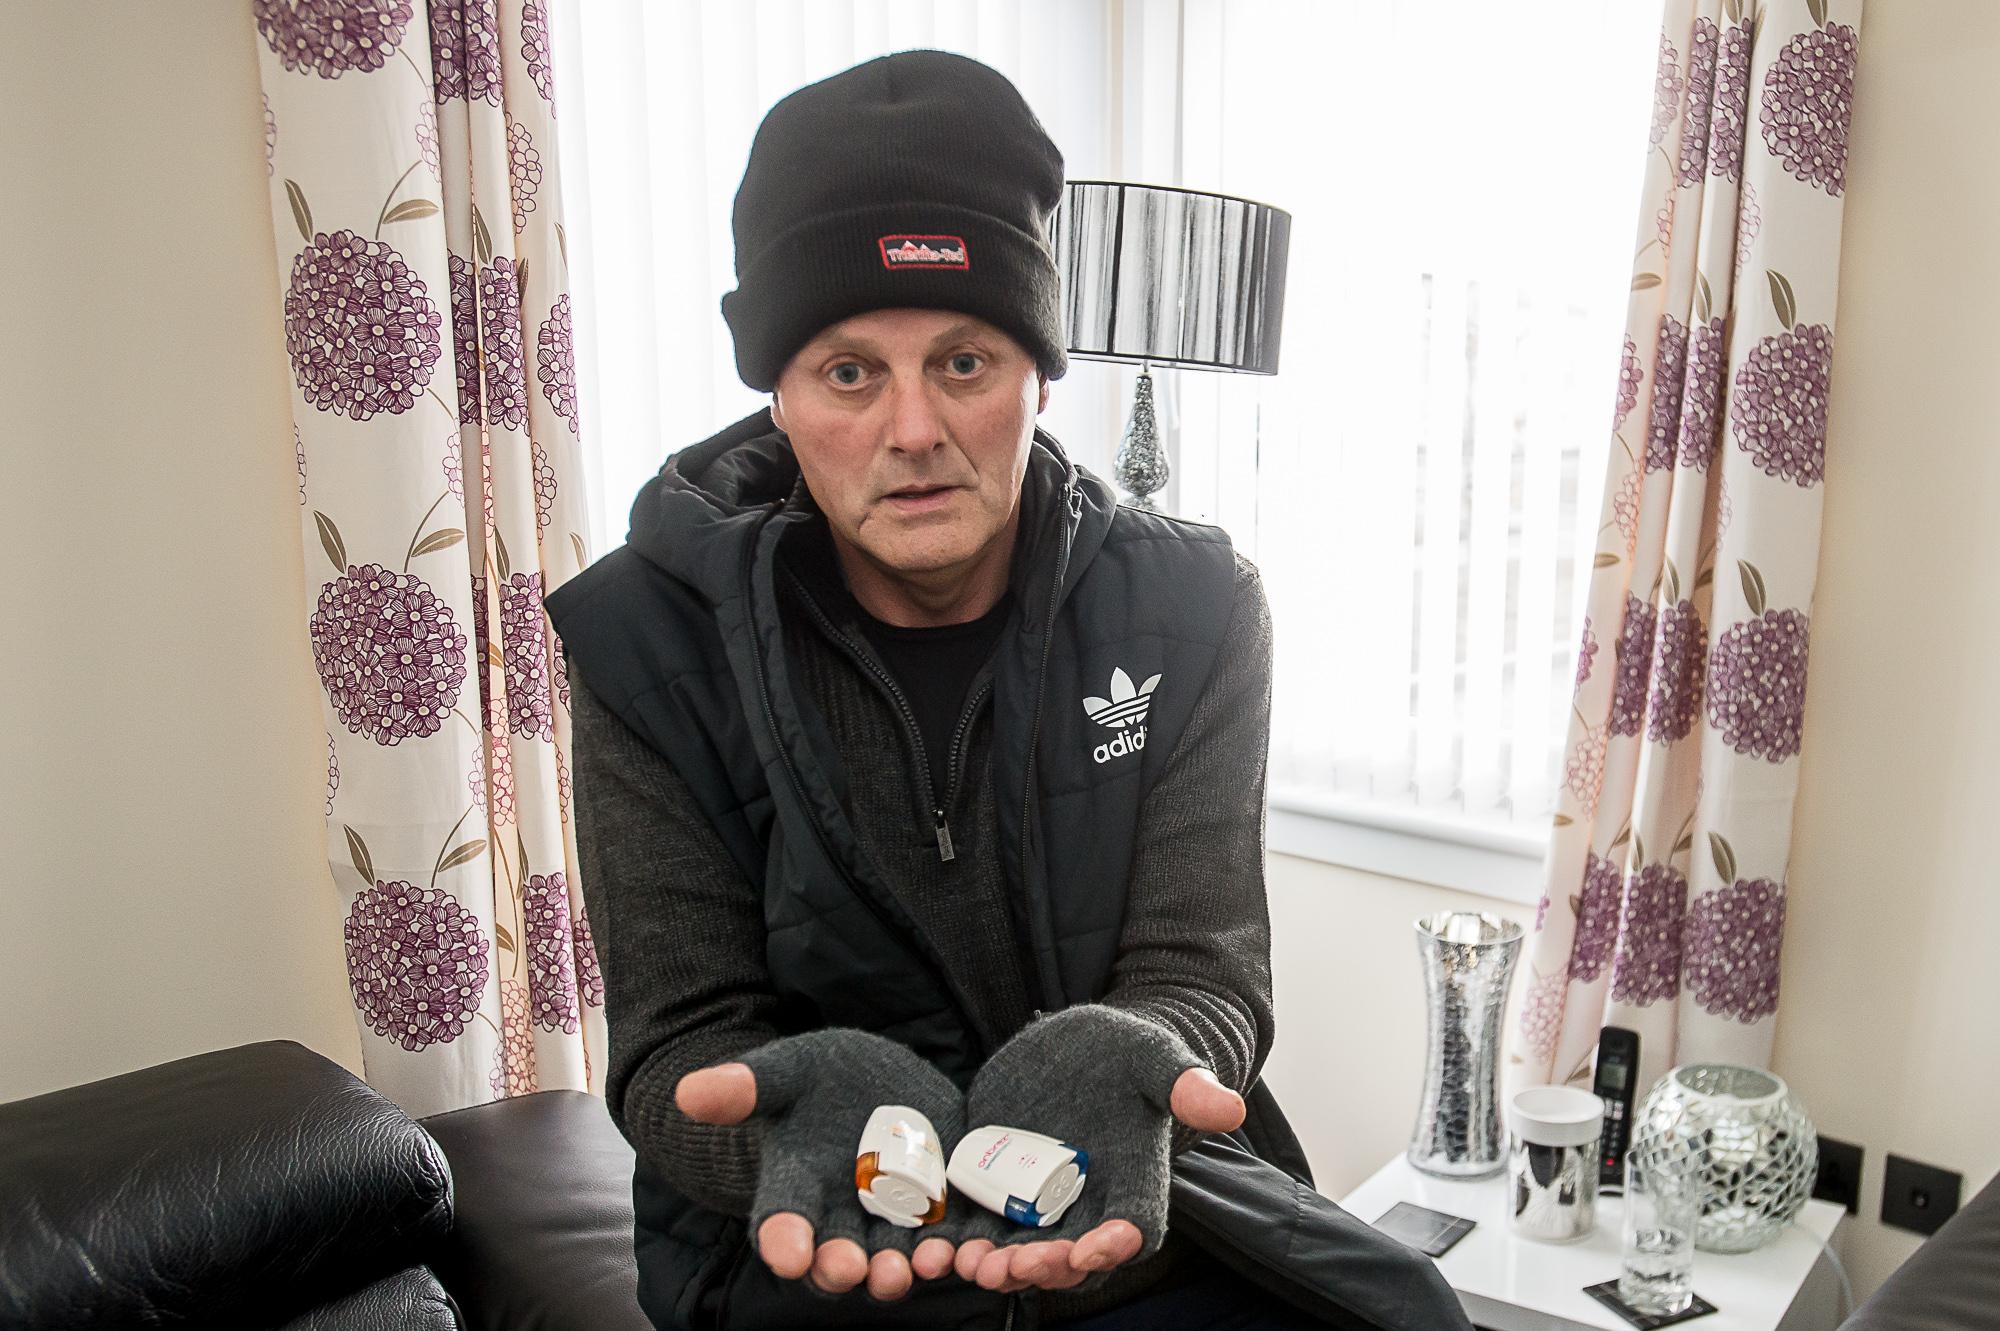 John with his medication